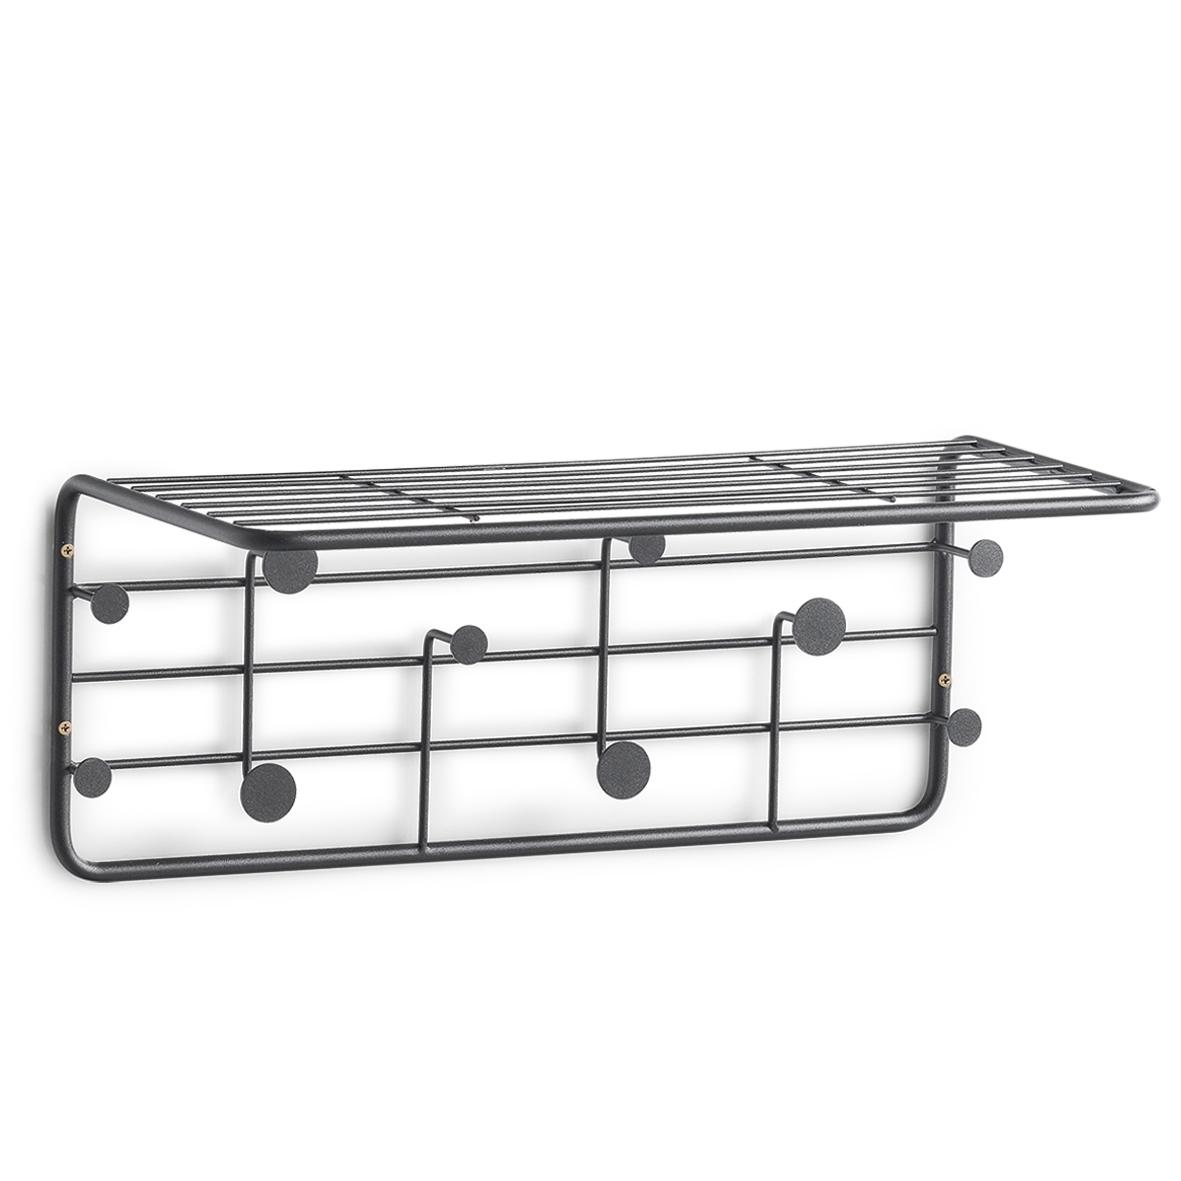 Cuier metalic cu etajera, Rack Negru, l51,4xA24xH21 cm imagine